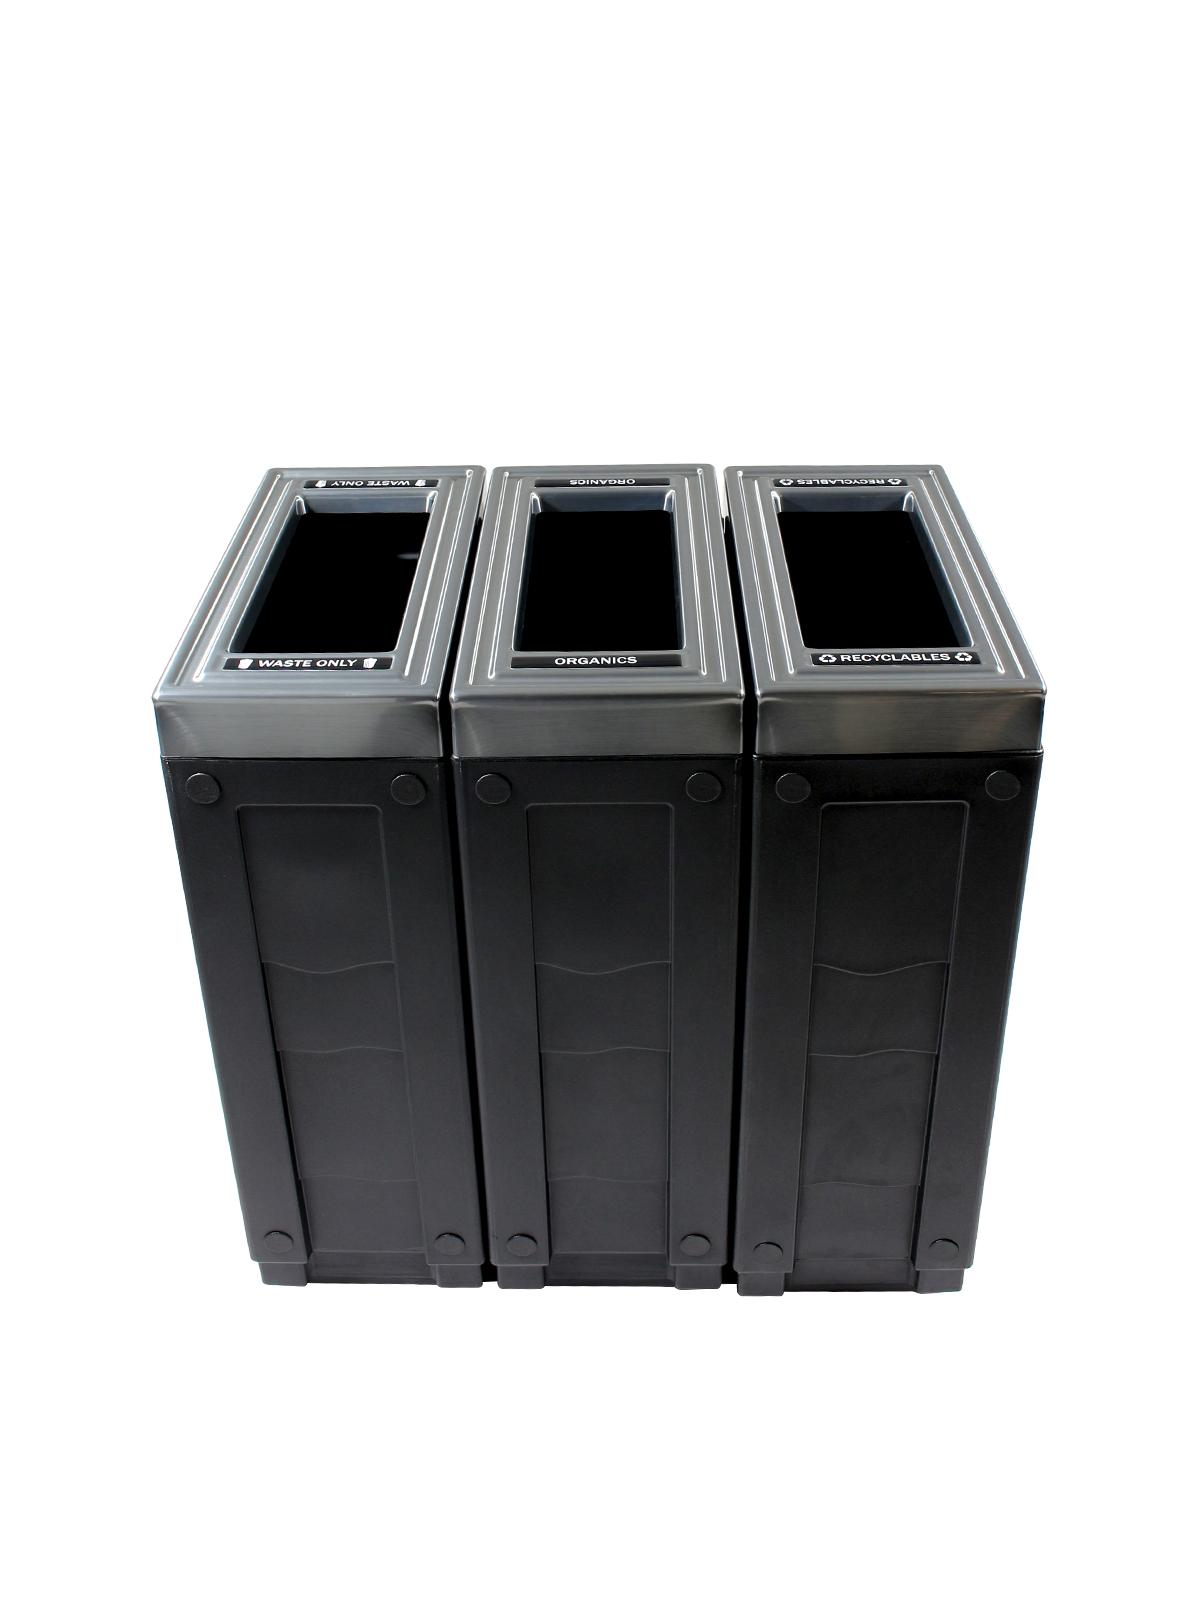 EVOLVE - Triple - Recyclables-Organics-Waste - Full - Black